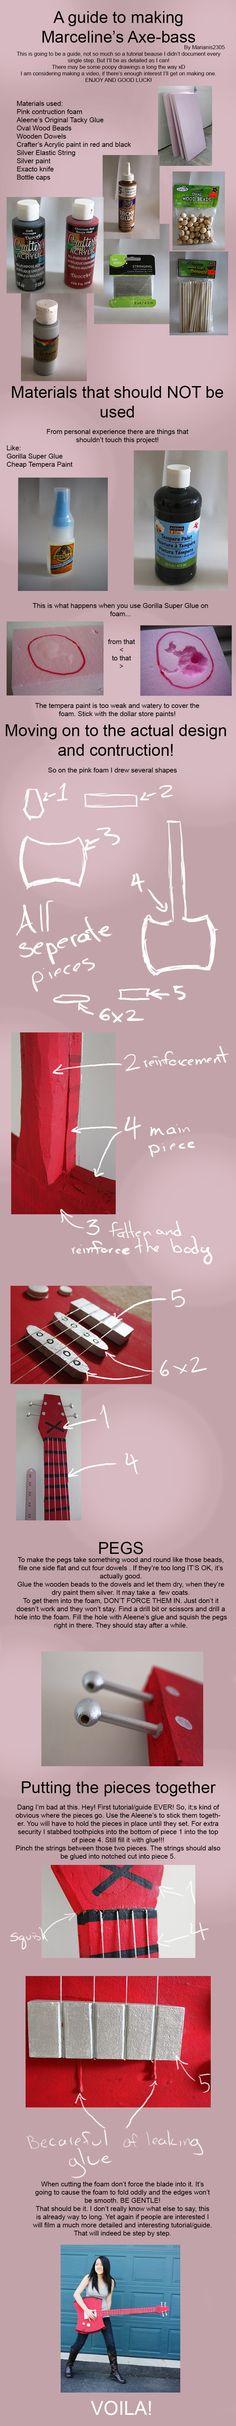 Marceline's Axe-Bass GUIDE by Marianis2305.deviantart.com on @deviantART